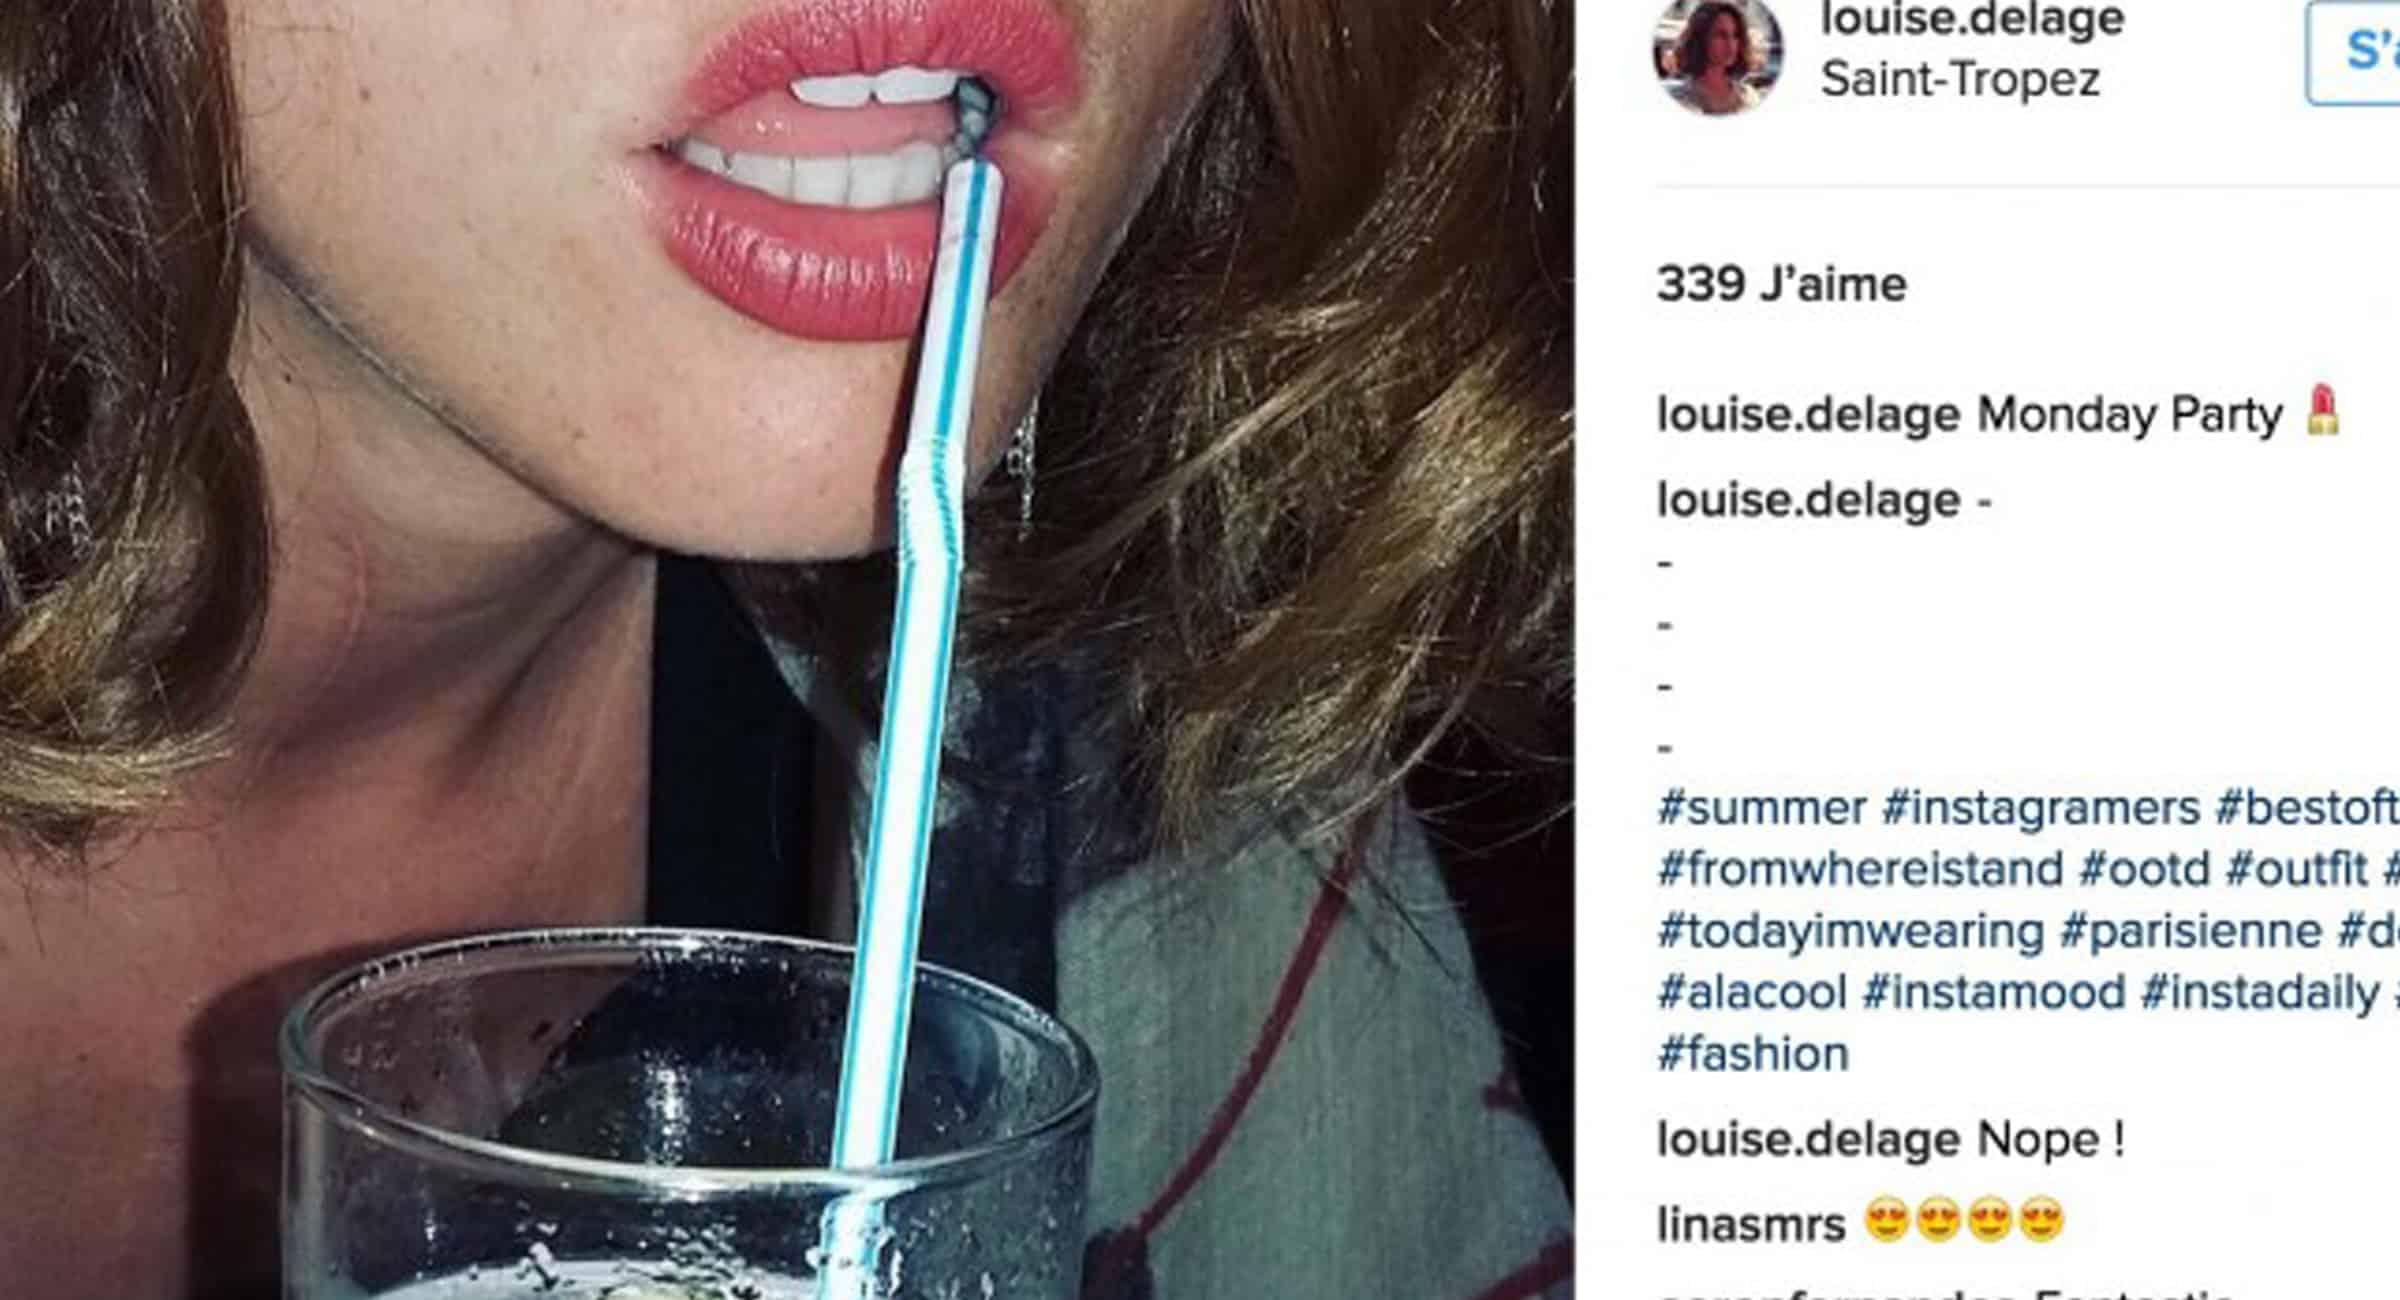 Louise Delage Instagram campaign